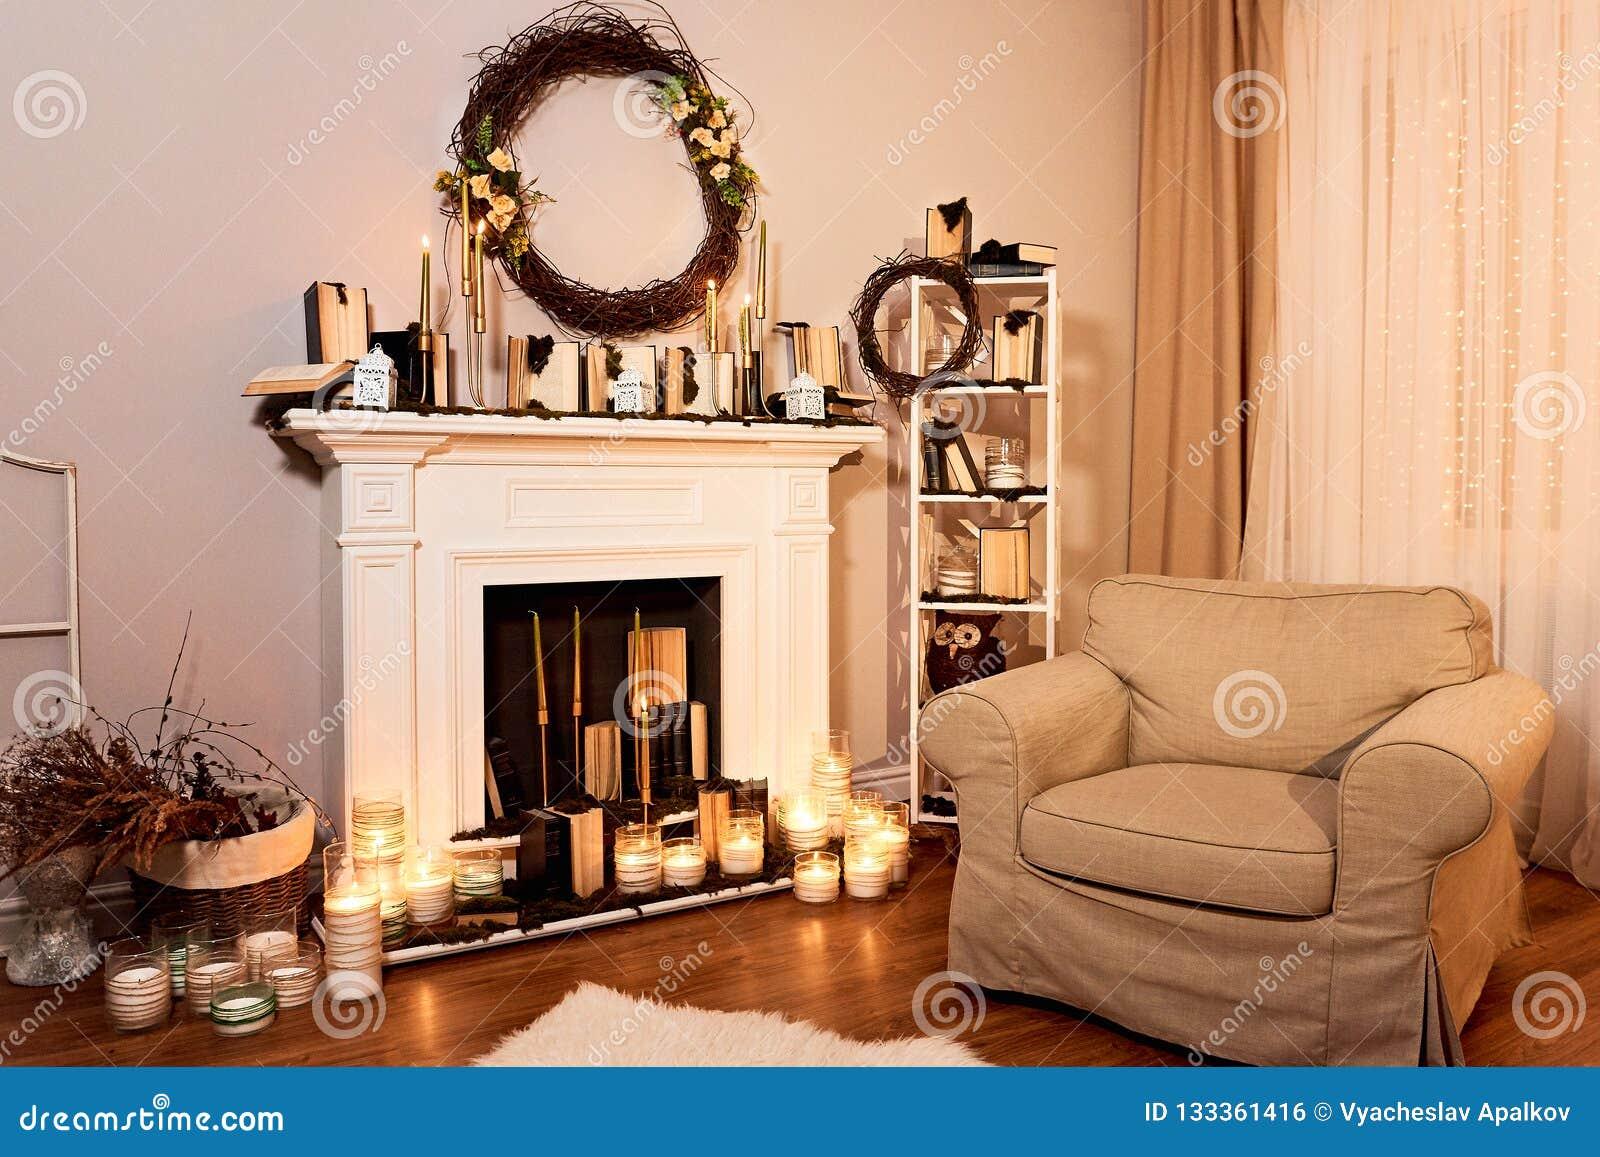 Tis Autumn Living Room Fall Decor Ideas: Modern Designed Spacious Living Room With Autumn